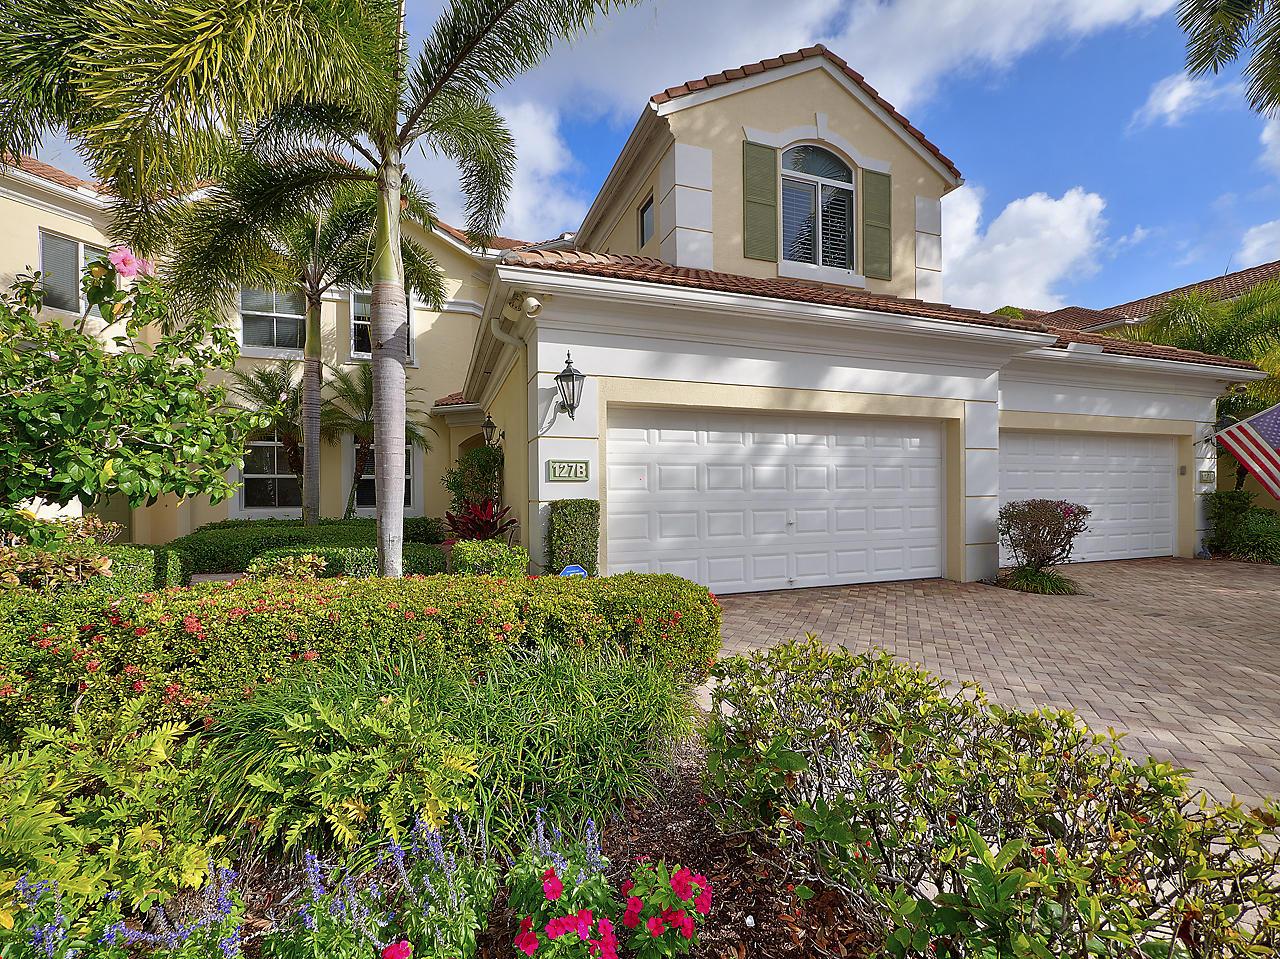 127 Palm Bay Terrace B, Palm Beach Gardens, Florida 33418, 3 Bedrooms Bedrooms, ,3 BathroomsBathrooms,A,Condominium,Palm Bay,RX-10591529